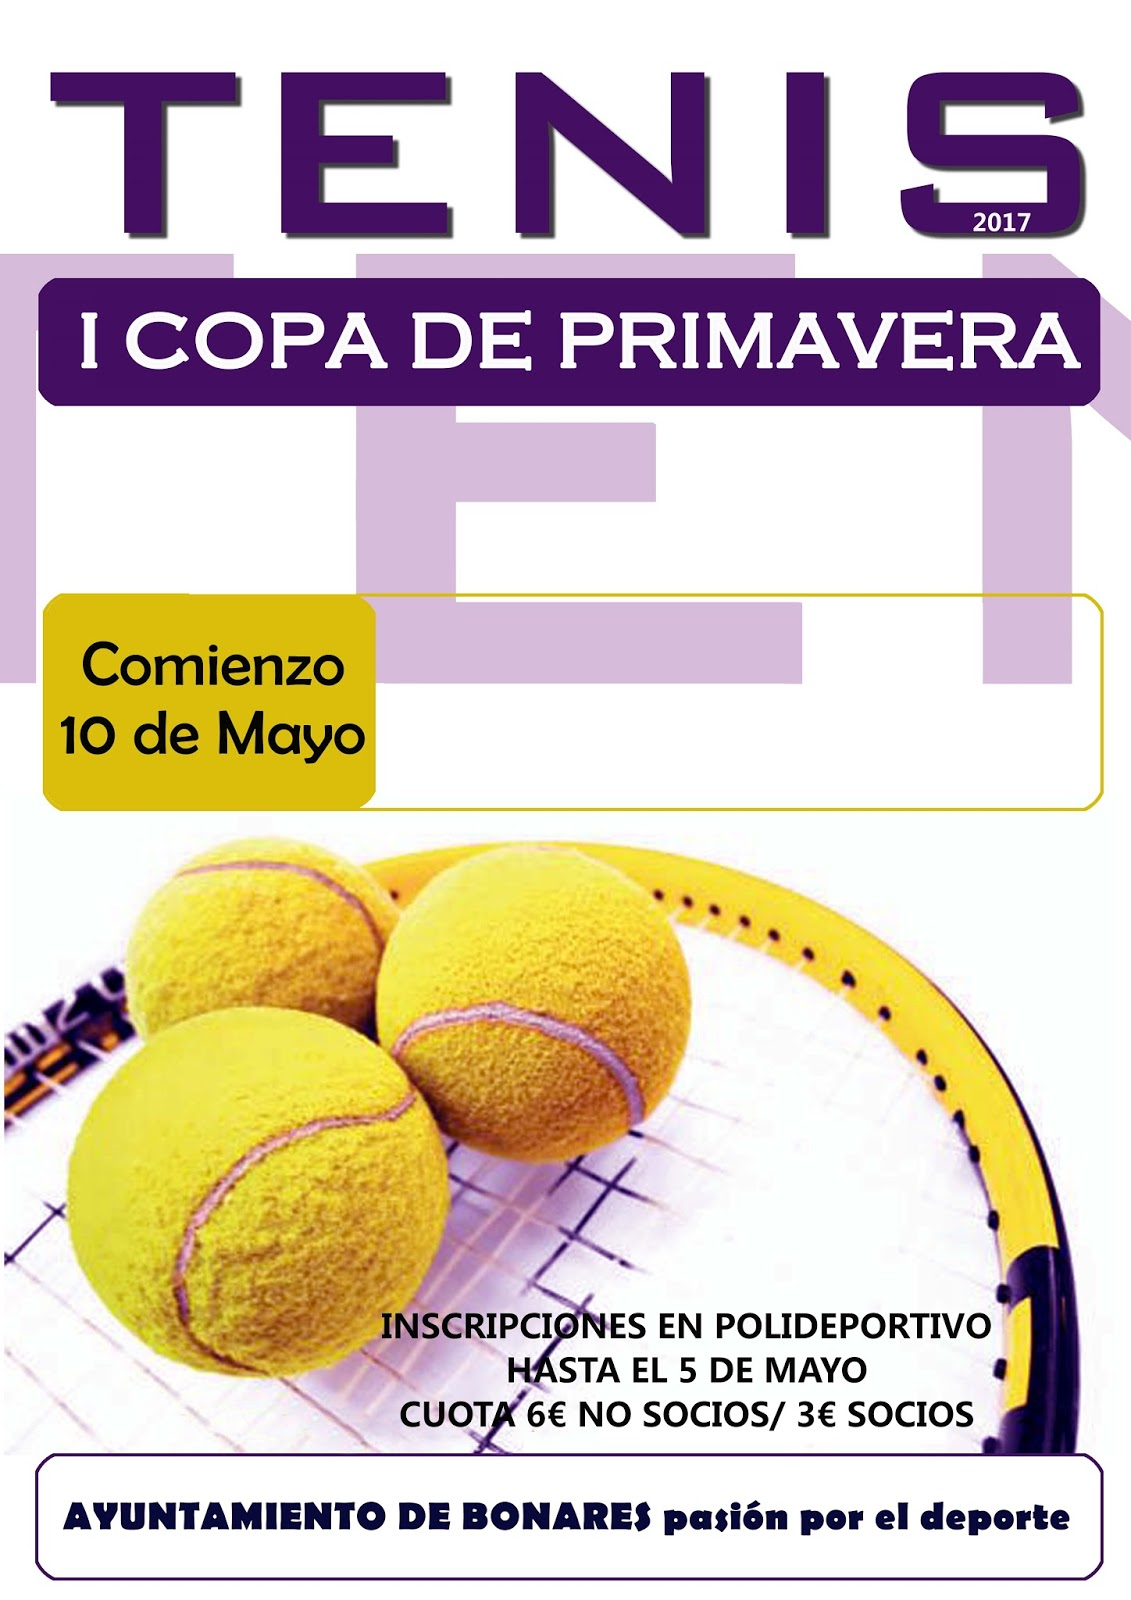 I COPA PRIMAVERA DE TENIS